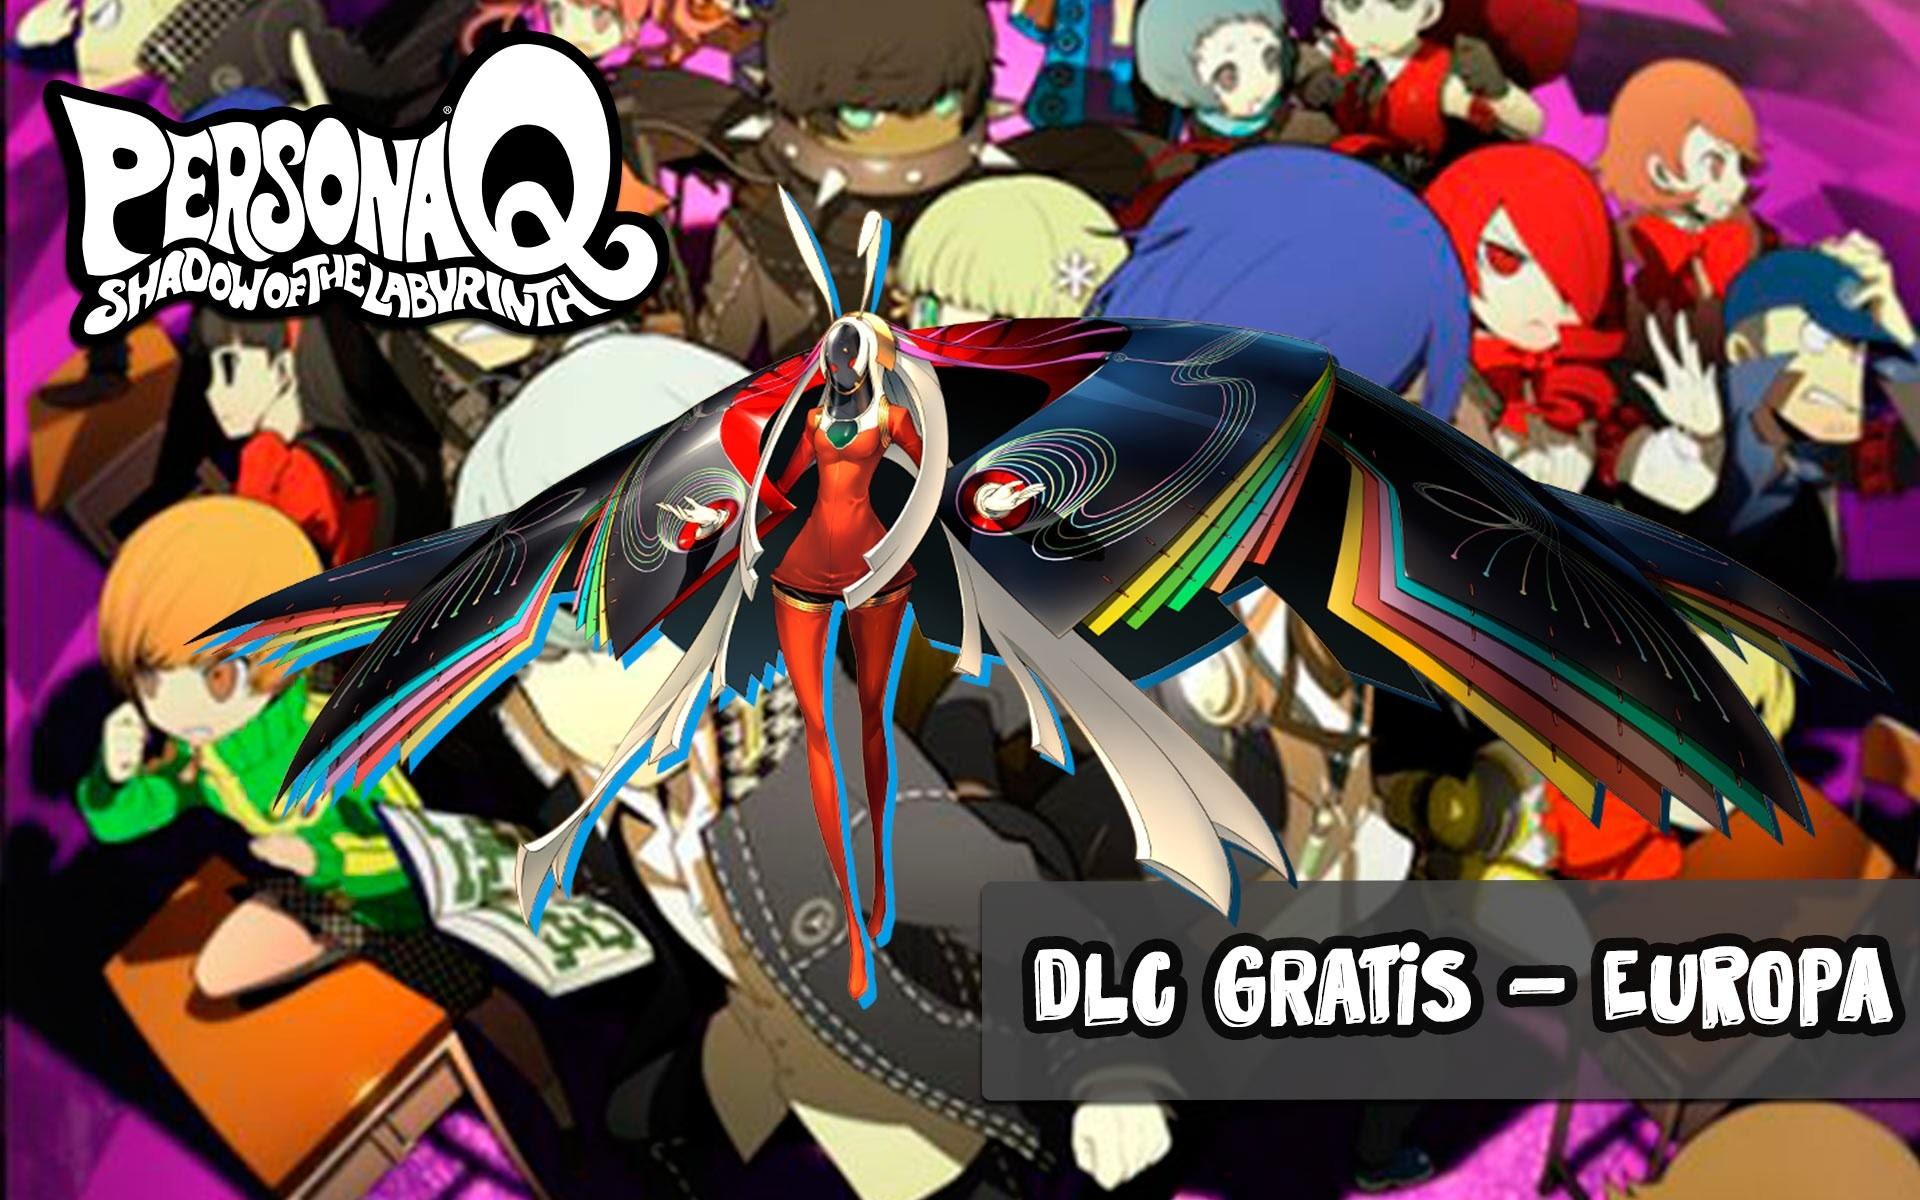 DLC Gratis: Kaguya – Persona Q: Shadow of the Labyrinth